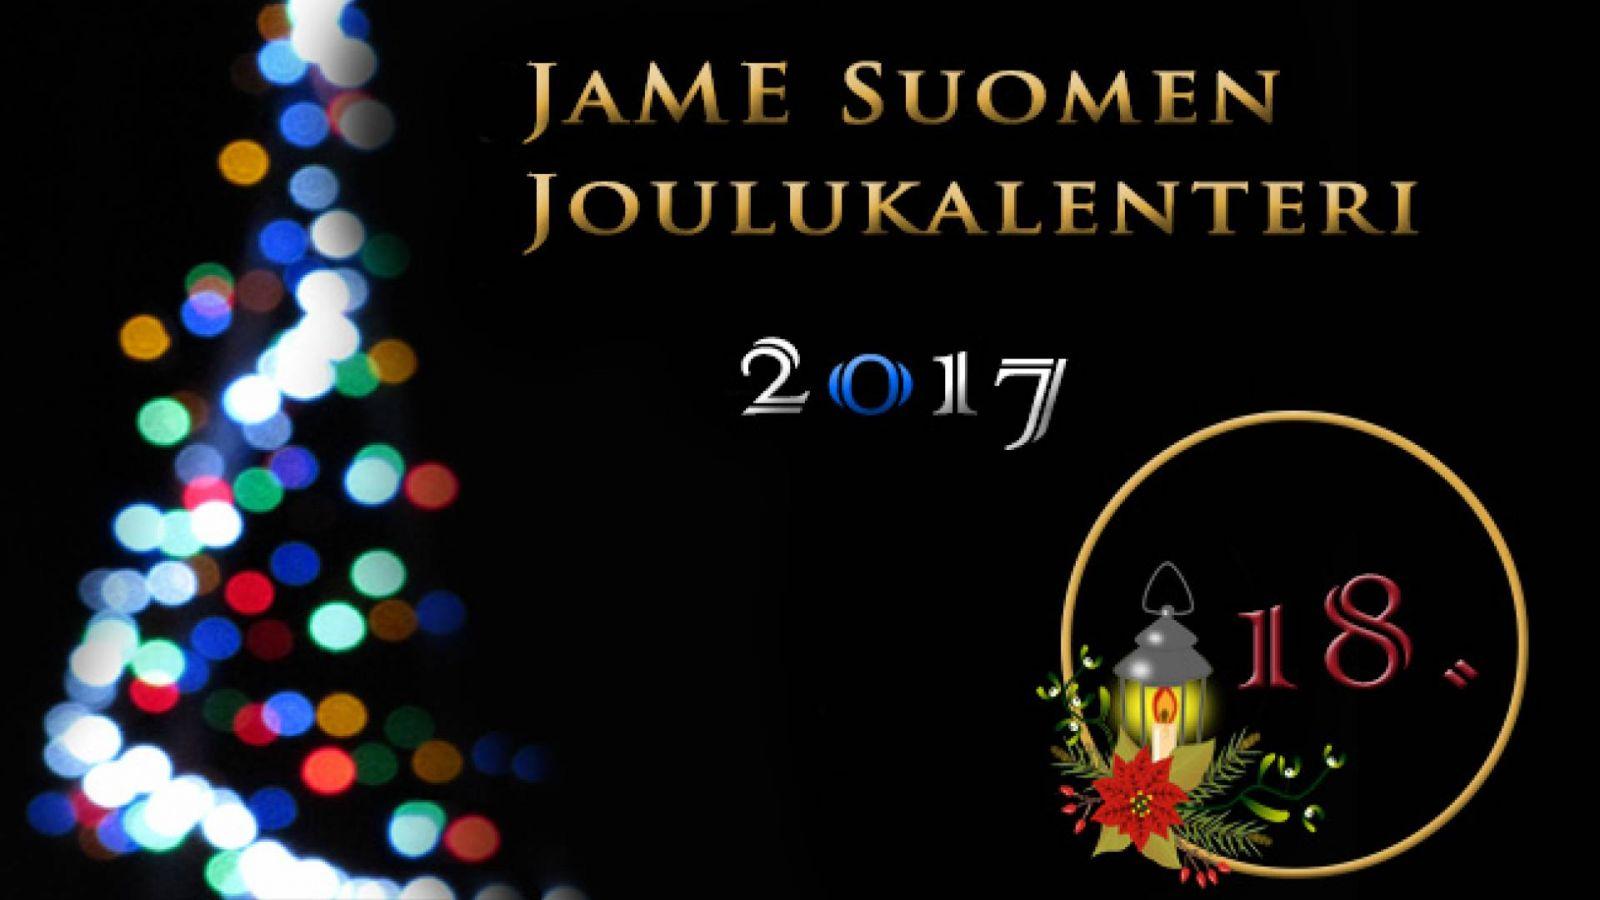 JaME Suomen joulukalenterin 18. luukku © Nipsu